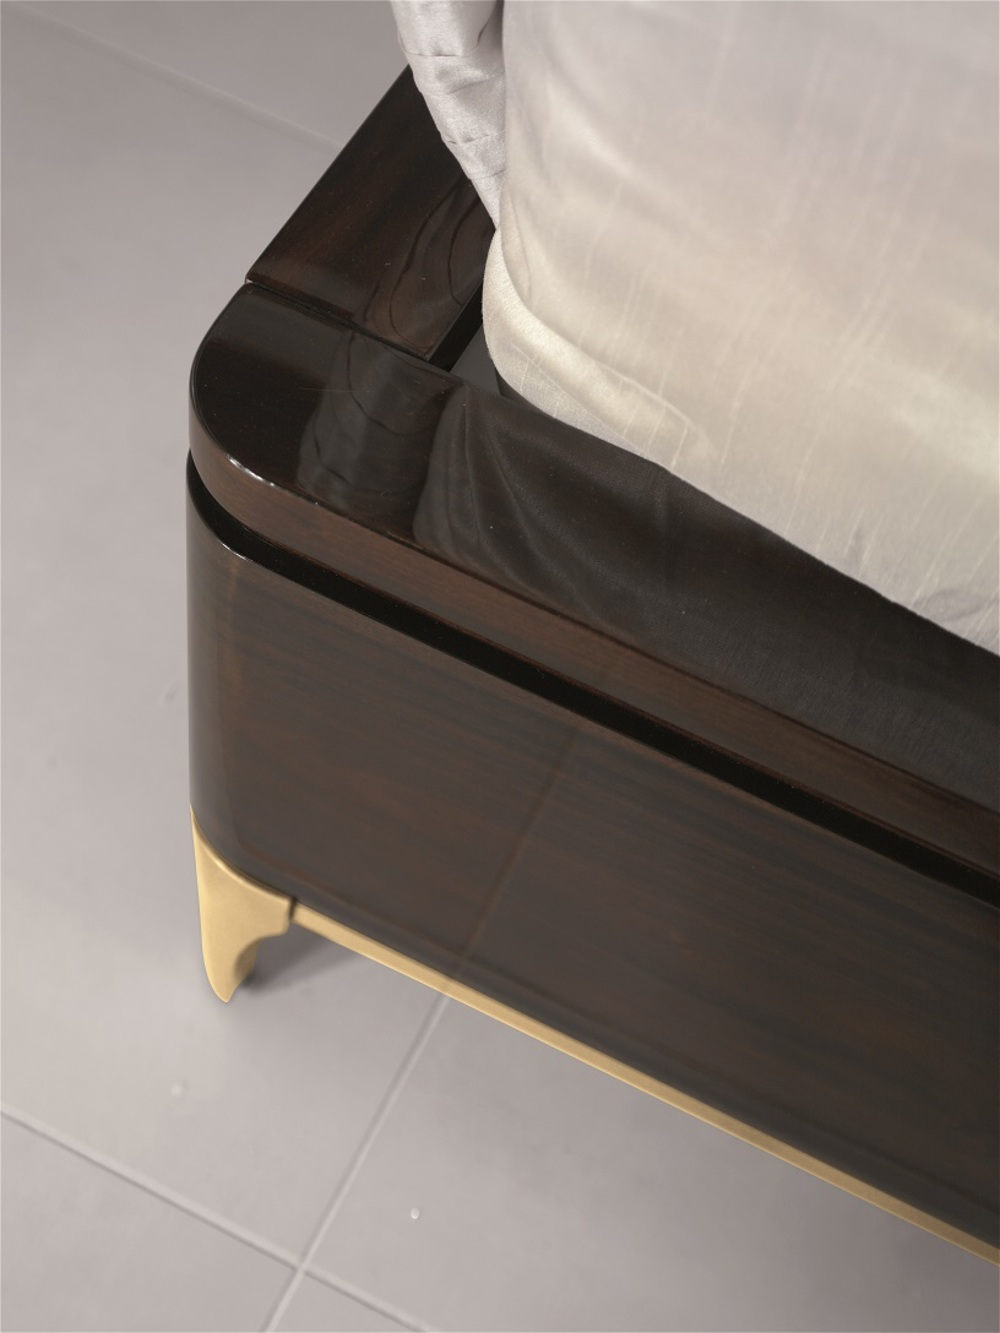 Hurtado - Soho Upholstered King Size Bed